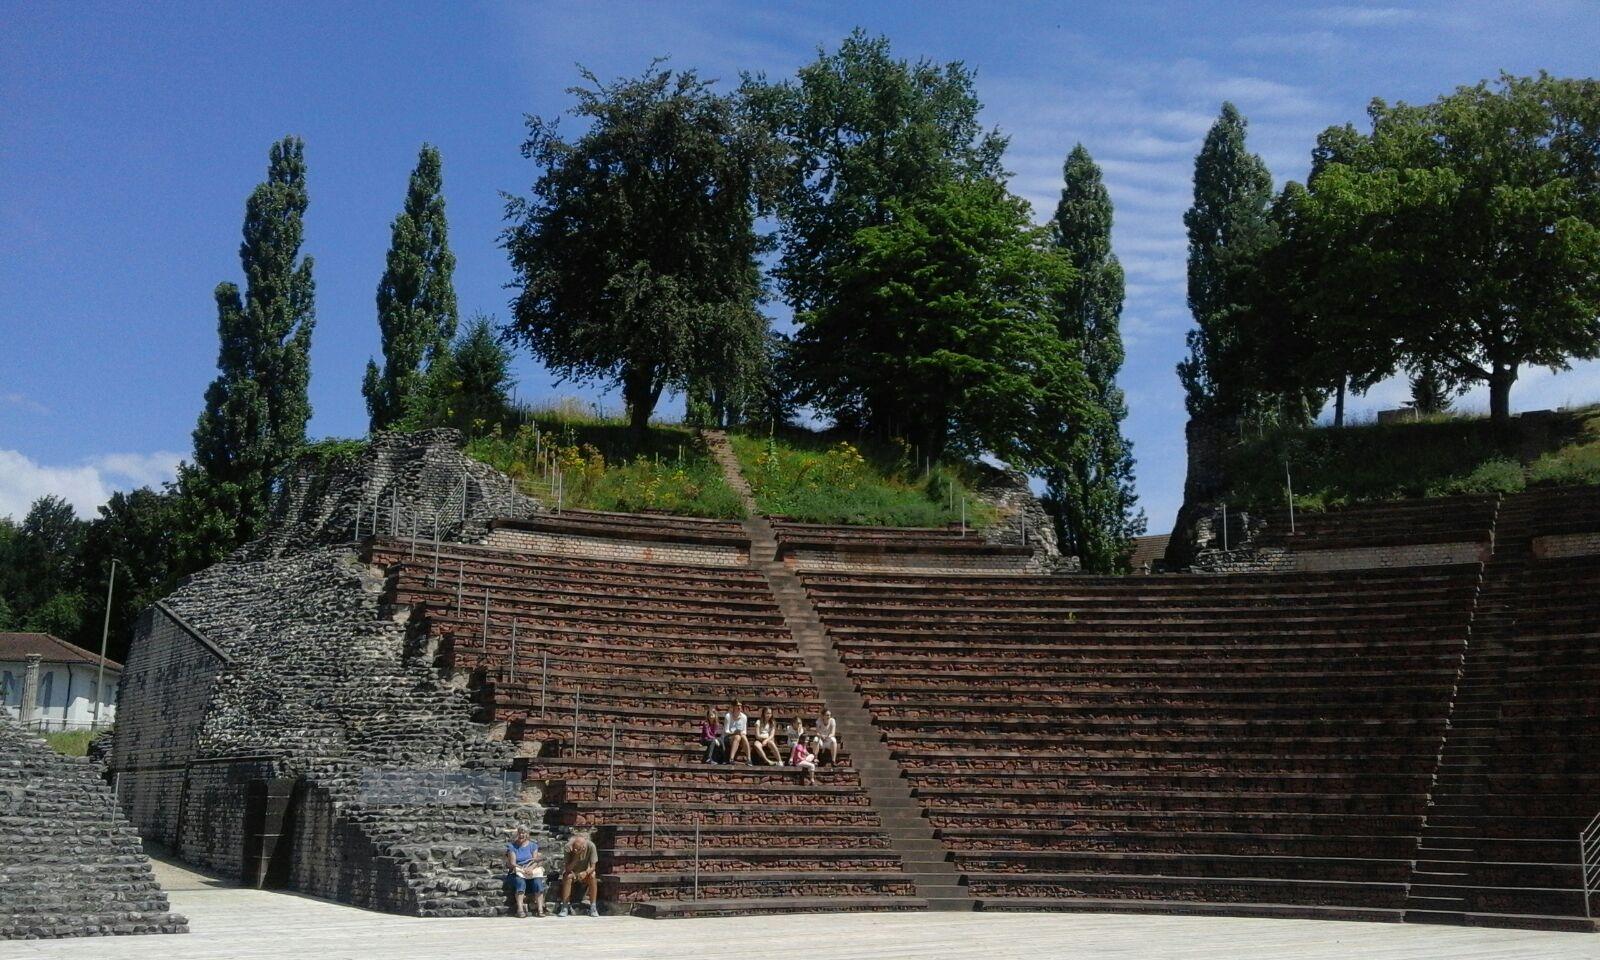 Strade d'Europa – Augusta Raurica: Romae et Augusto